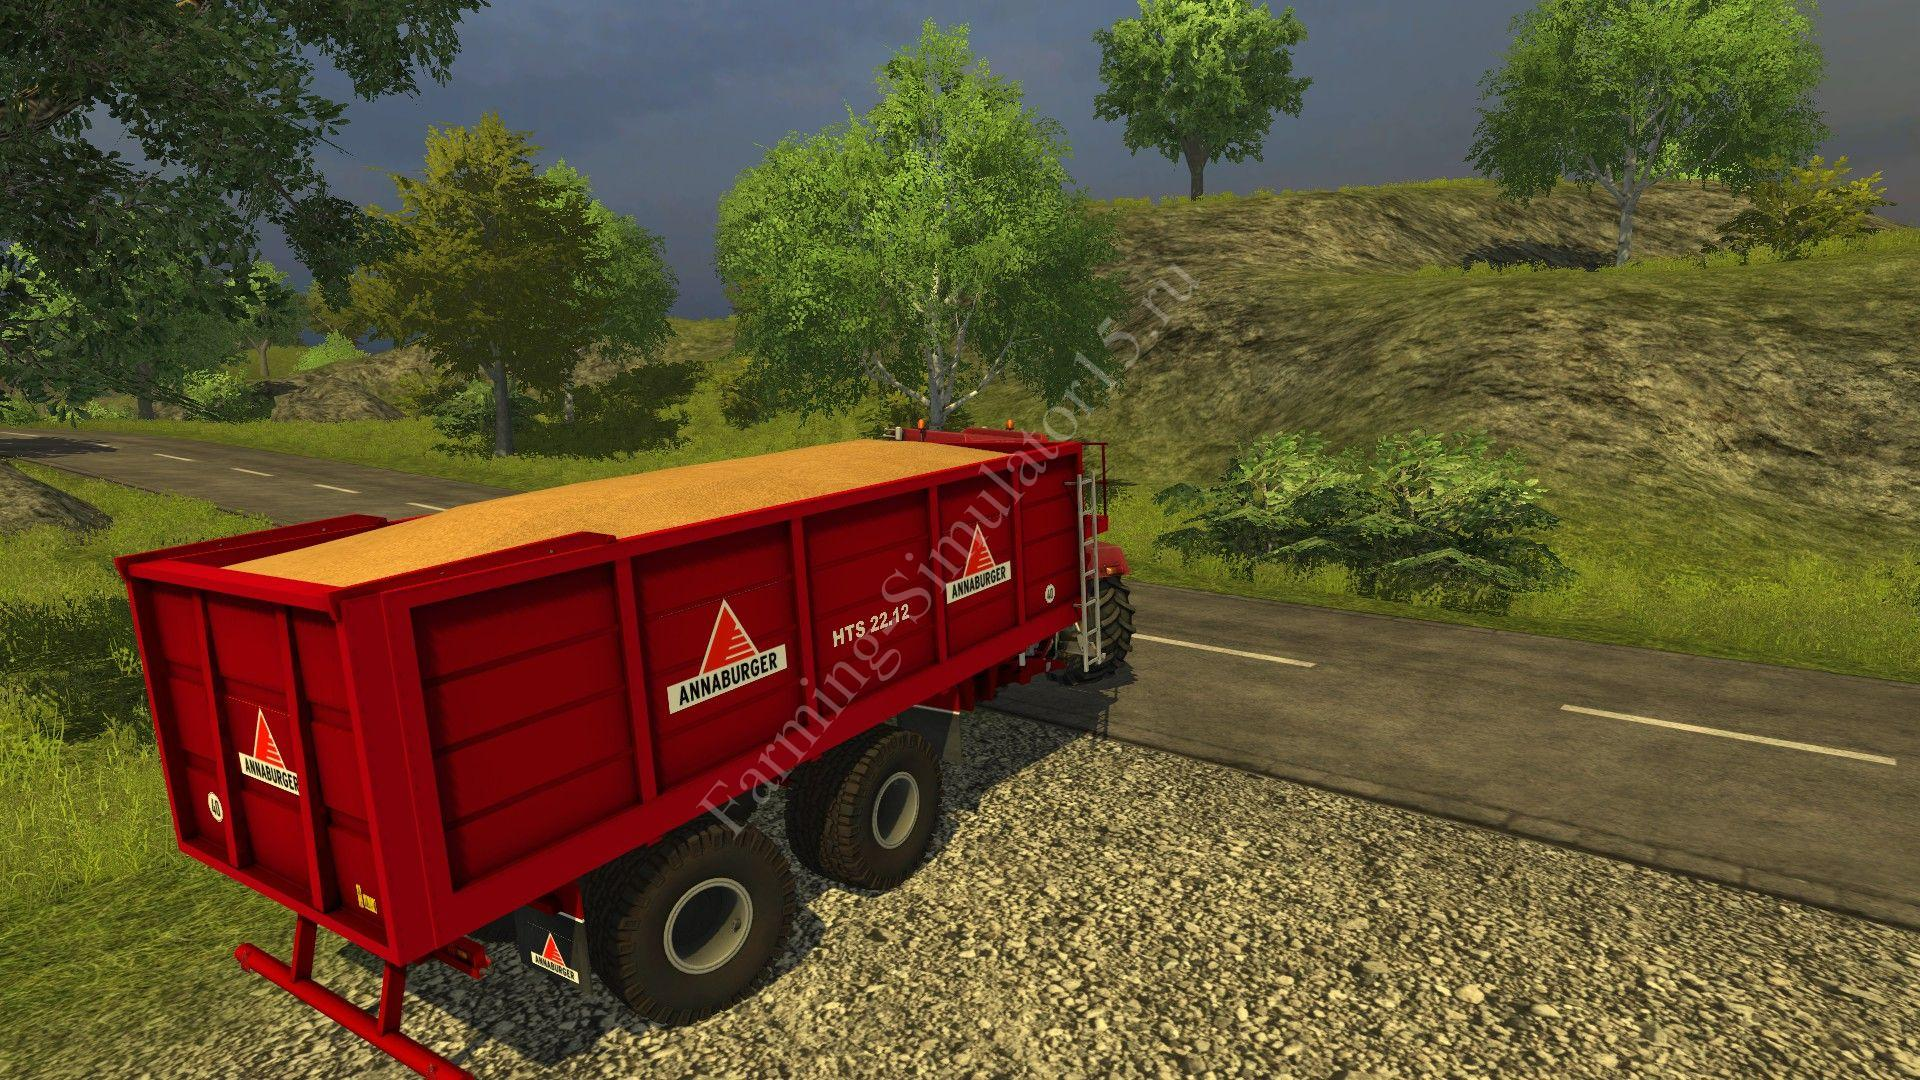 Мод прицепа Anna Burger HTS 22 14 v 3.1 More Realistic Farming Simulator 2013, Farming Simulator 13